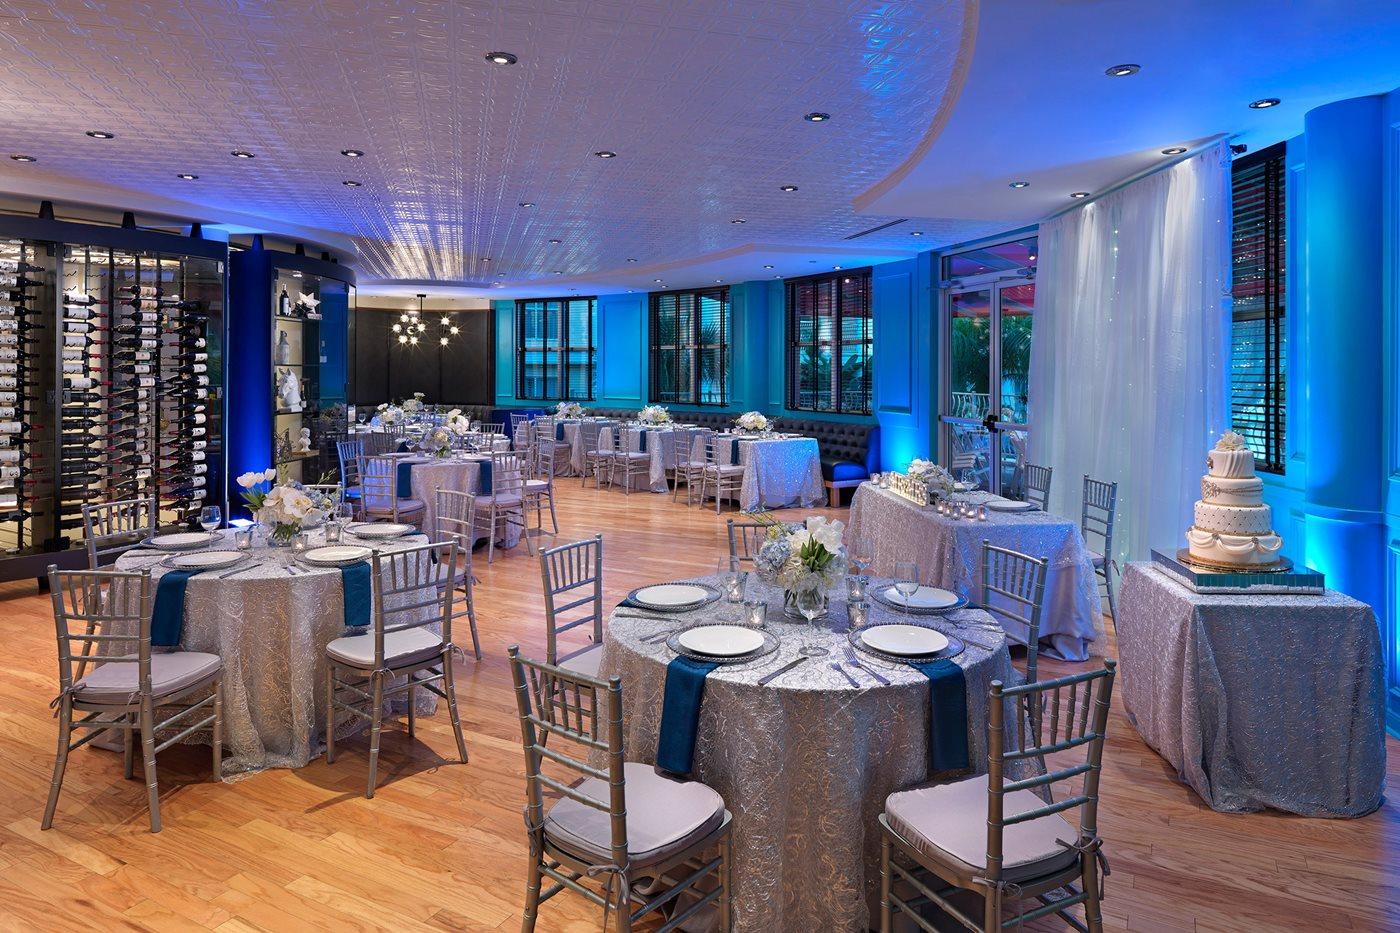 Melia Orlando Suite Hotel At Celebration Orlando Transat